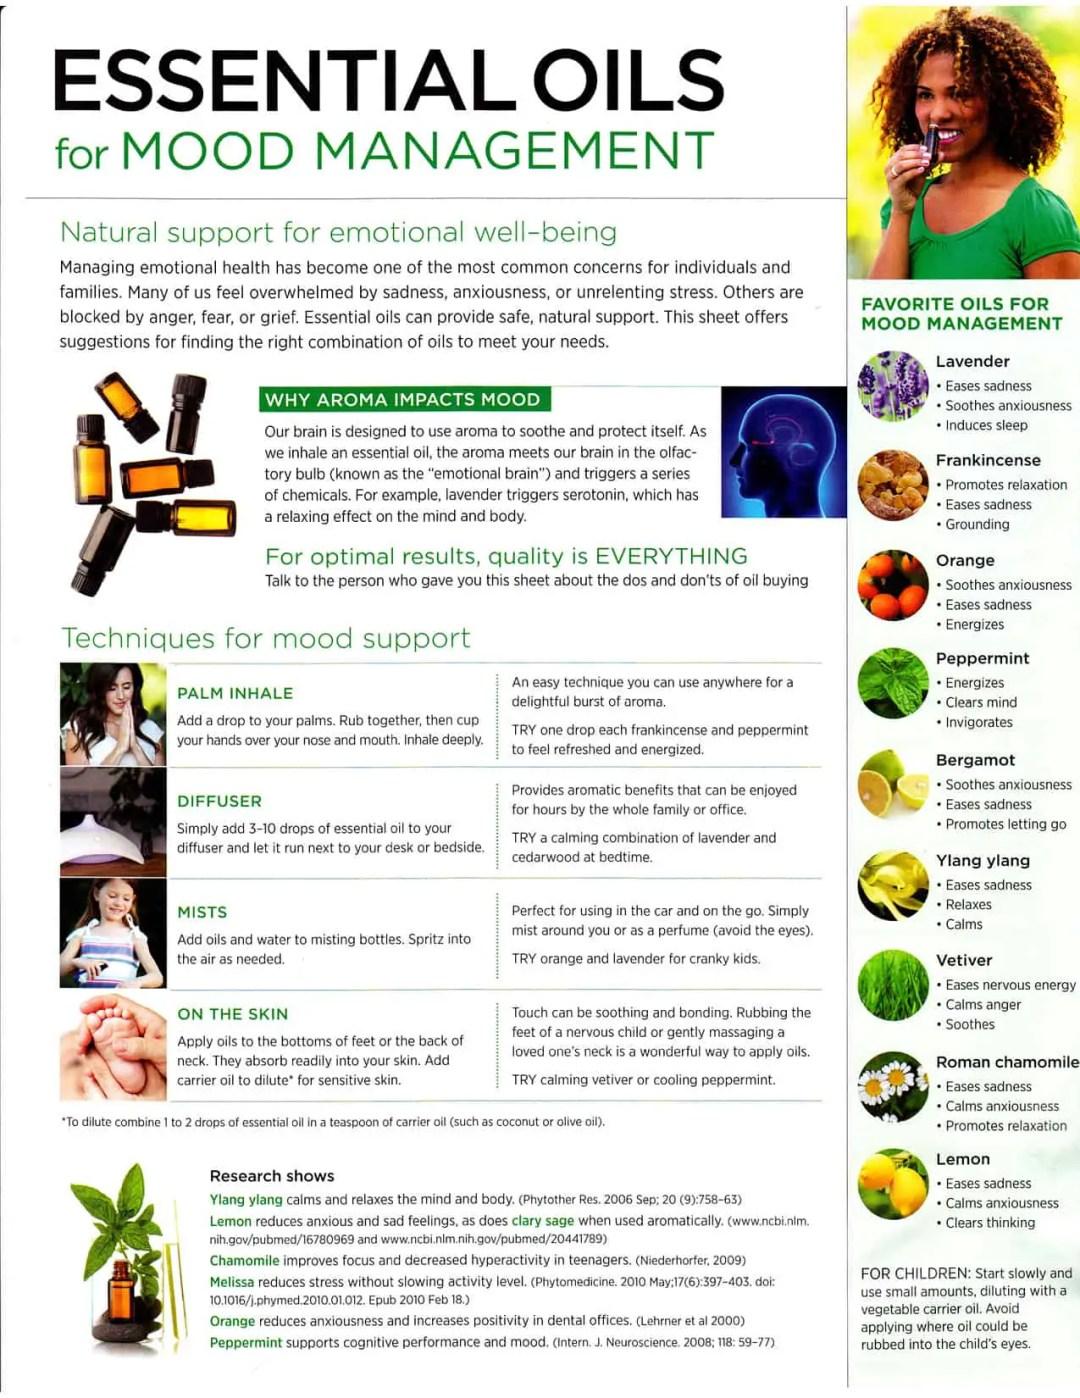 Essential Oils for Mood Management